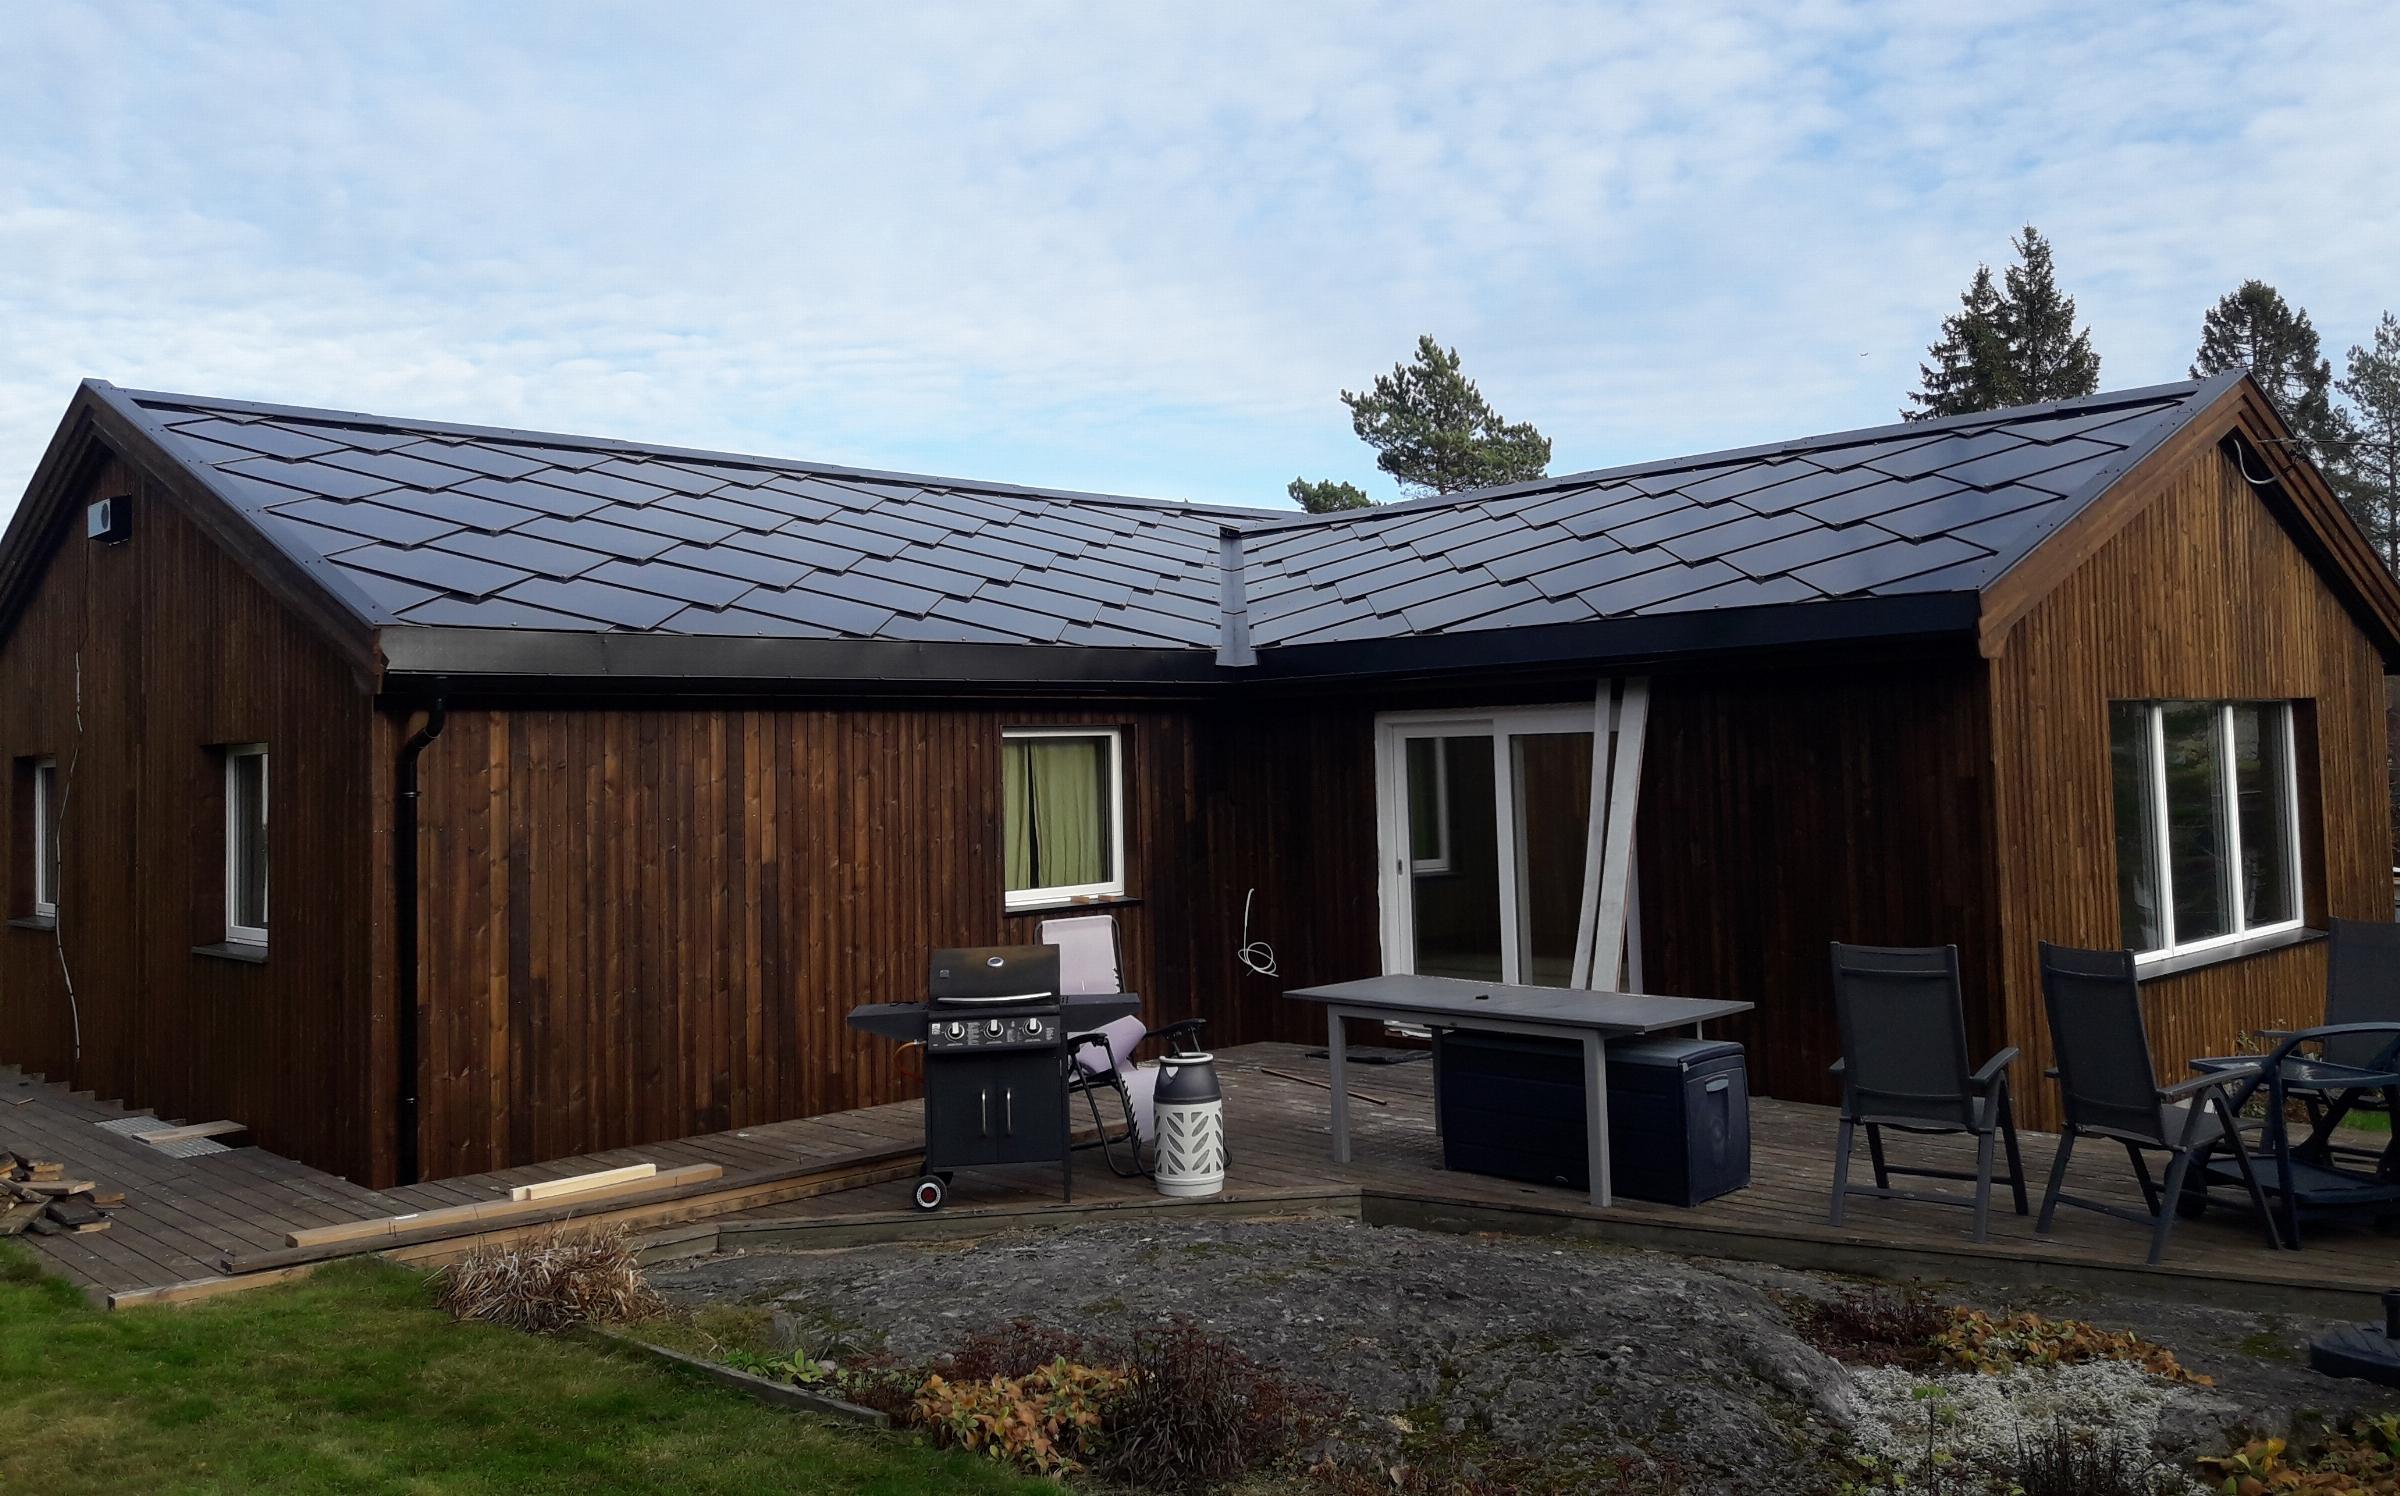 Hvorfor skal jeg ha solceller på taket mitt?